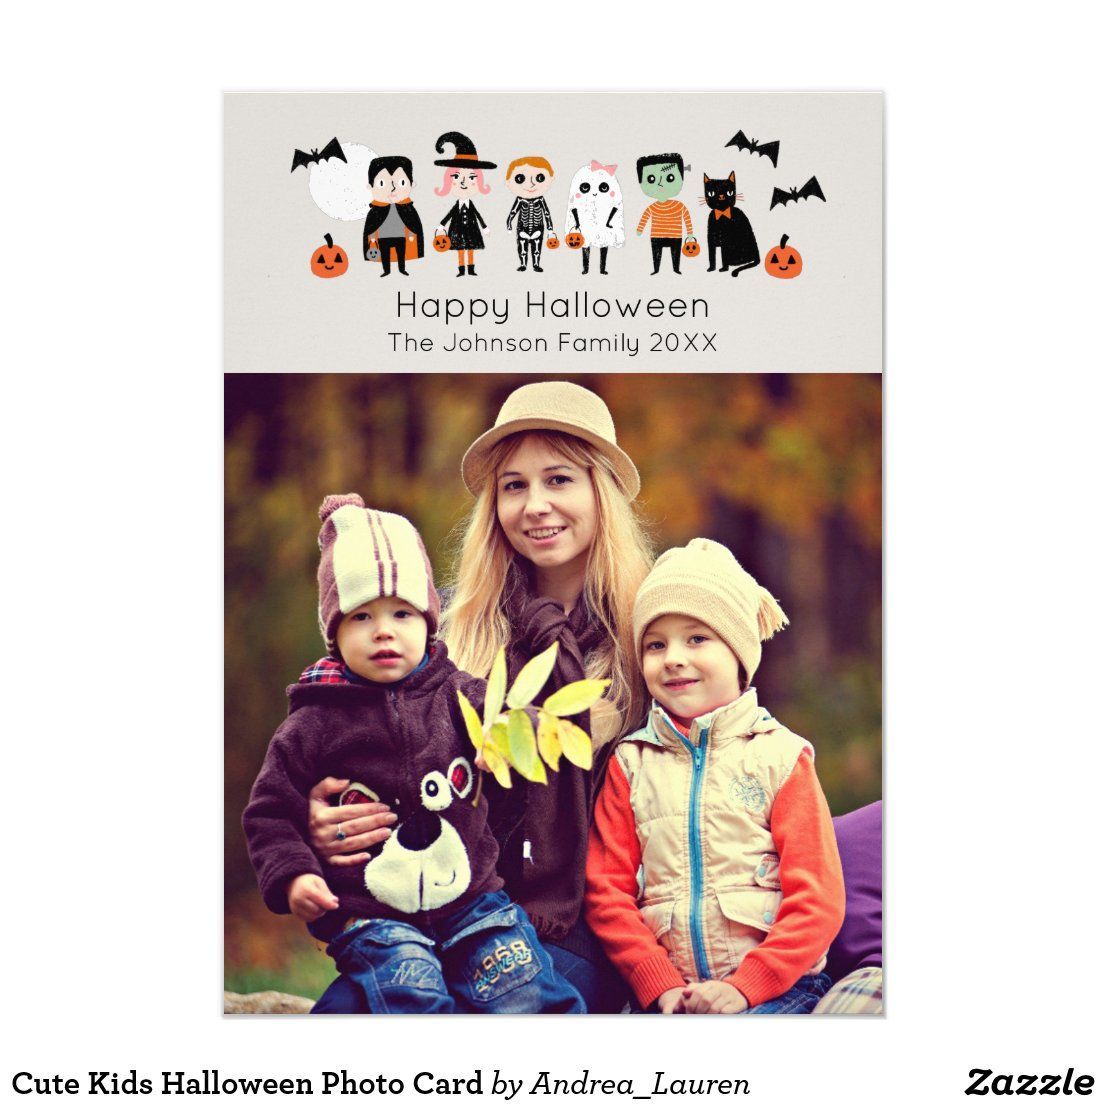 Halloween 2020 Cards For Kids Cute Kids Halloween Photo Card | Zazzle.in 2020 | Halloween